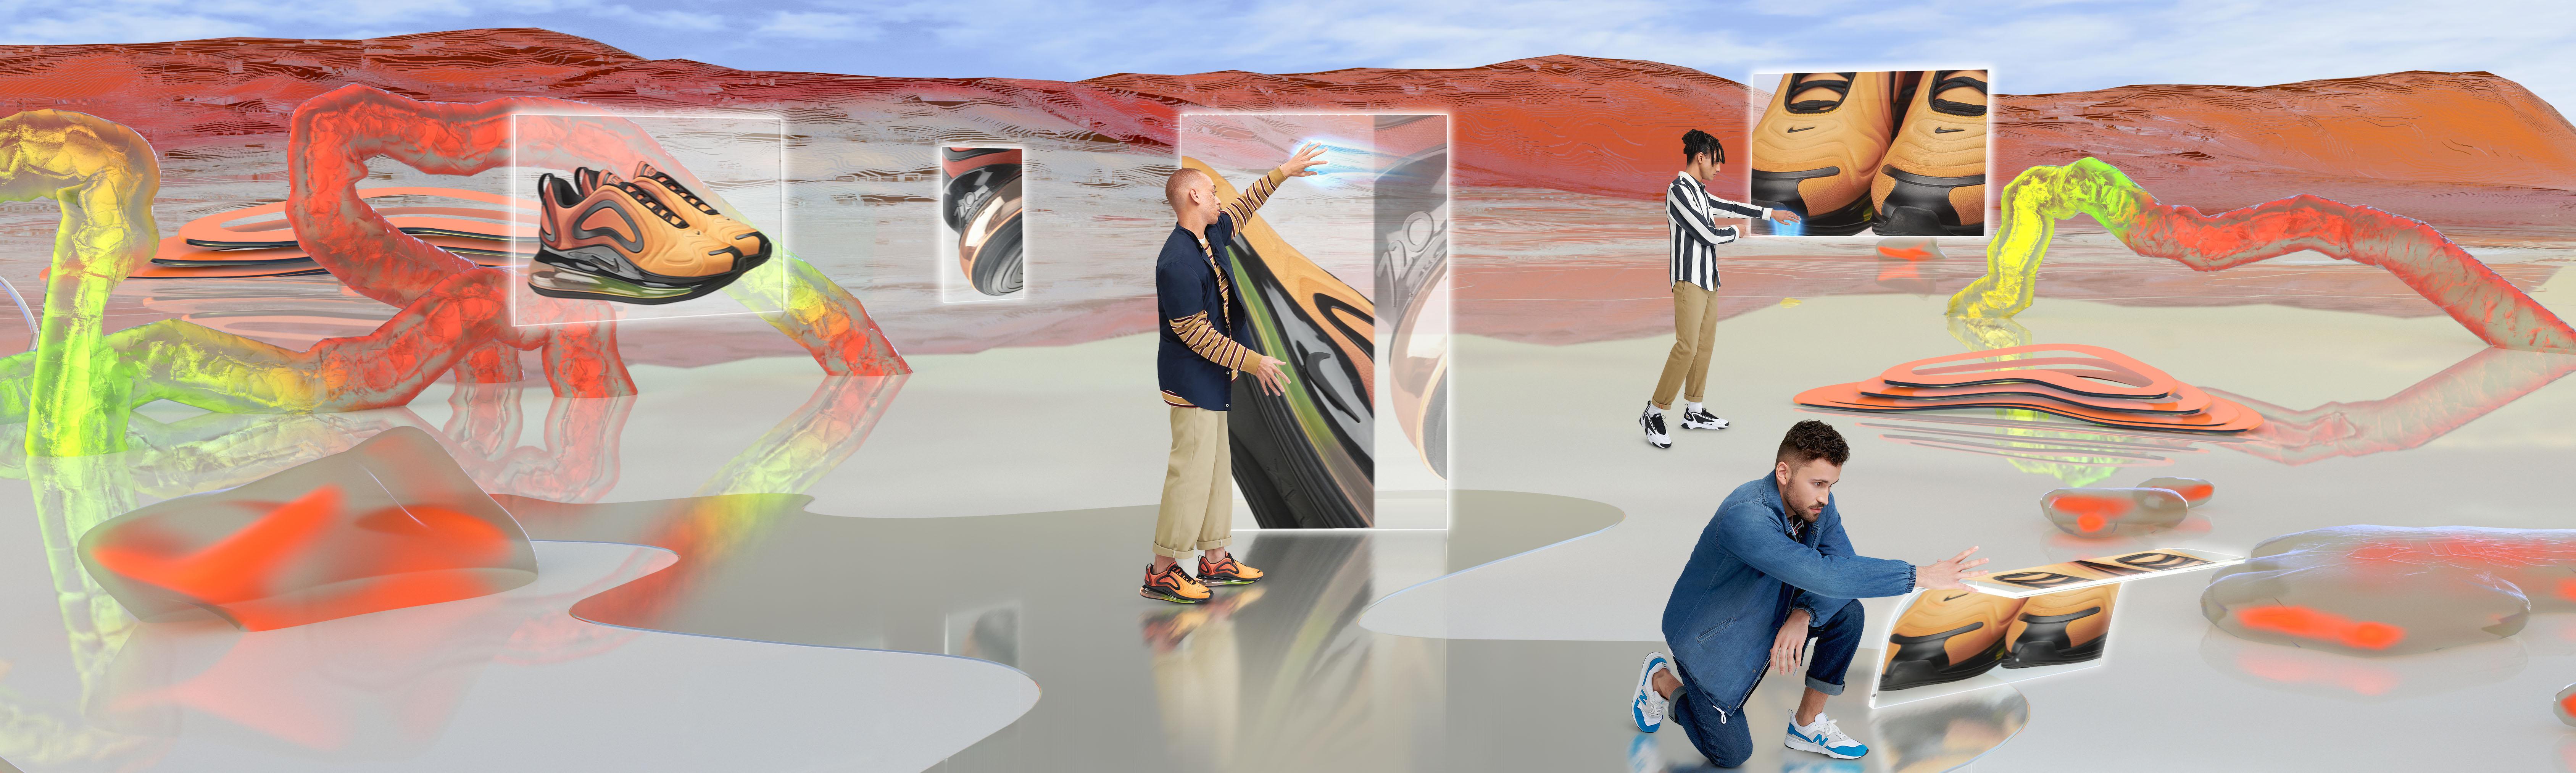 Zalando's website becomes a virtual